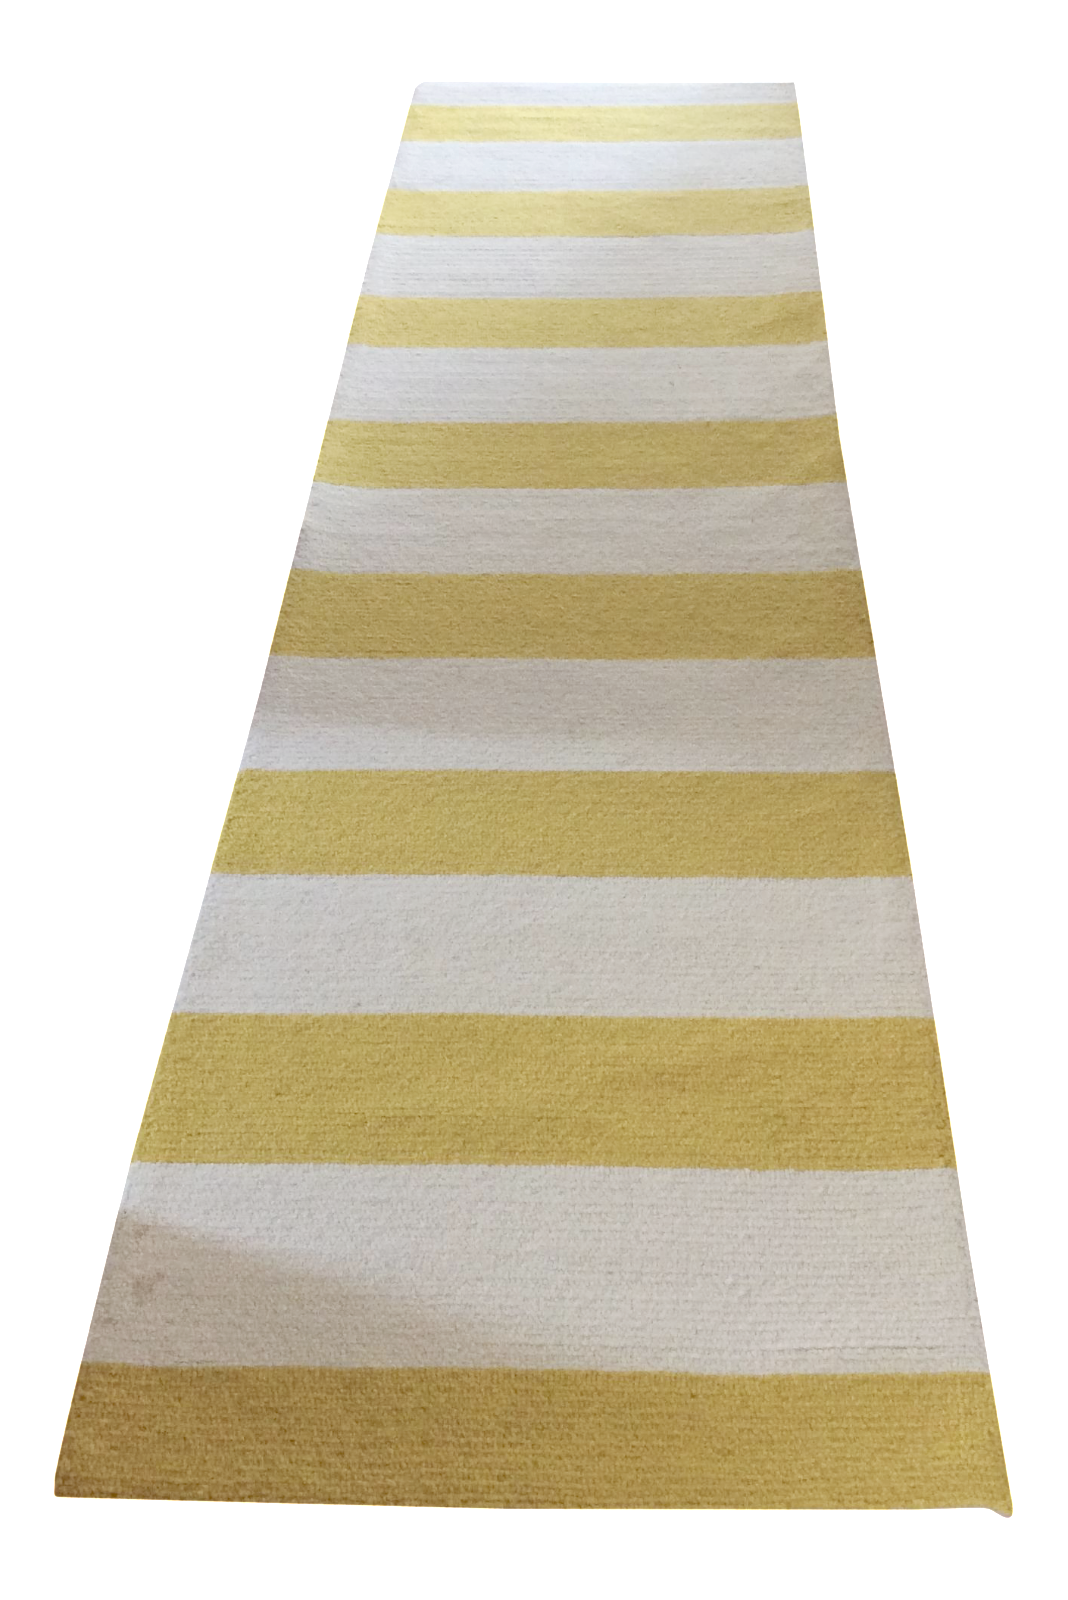 nu loom yellow white striped rug 3 6 10 chairish. Black Bedroom Furniture Sets. Home Design Ideas